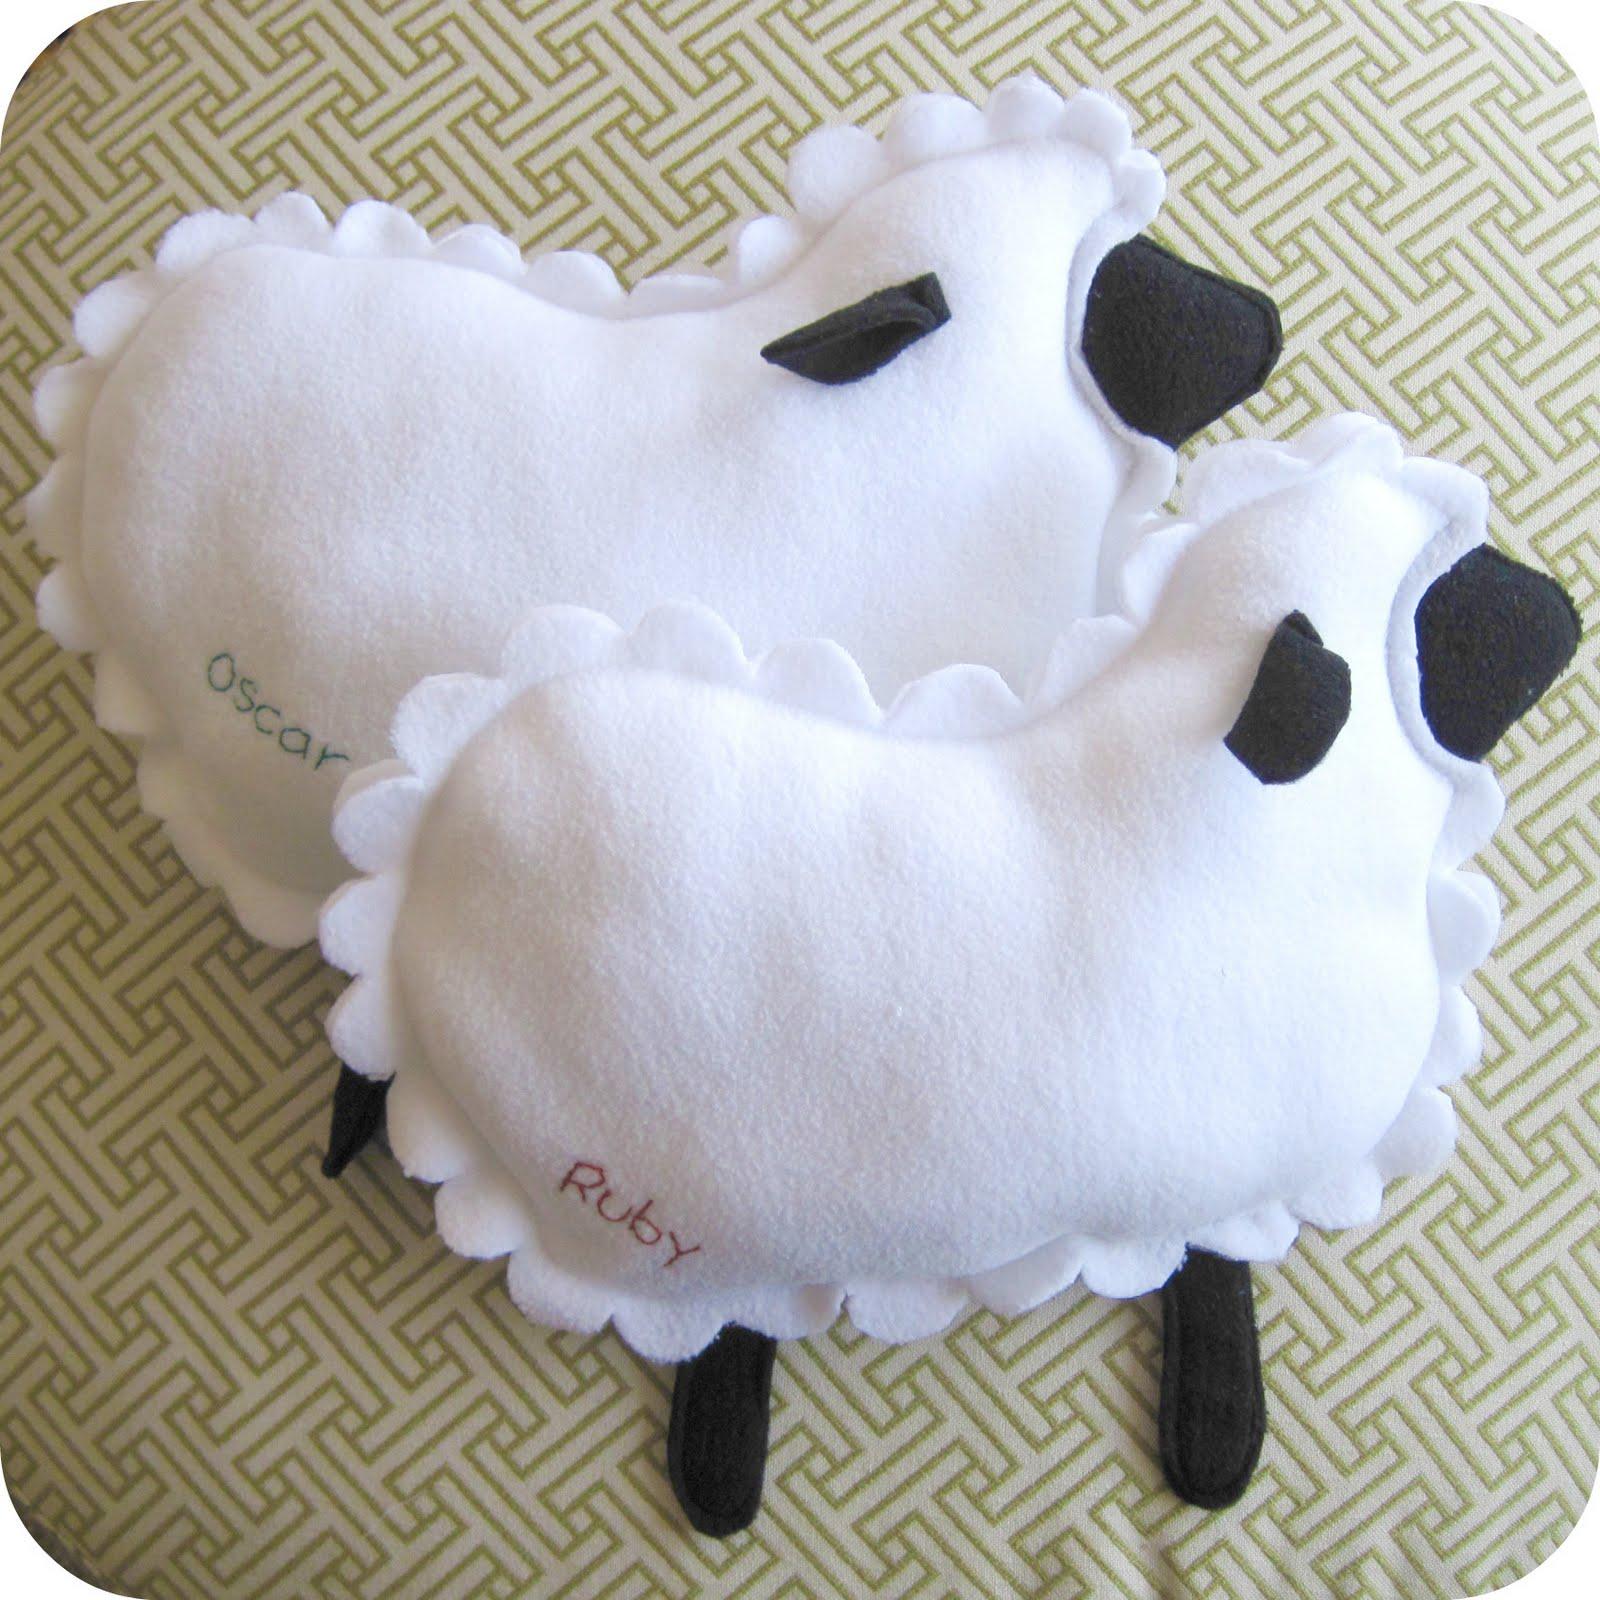 Овца коза своими руками - PC-dzr.ru